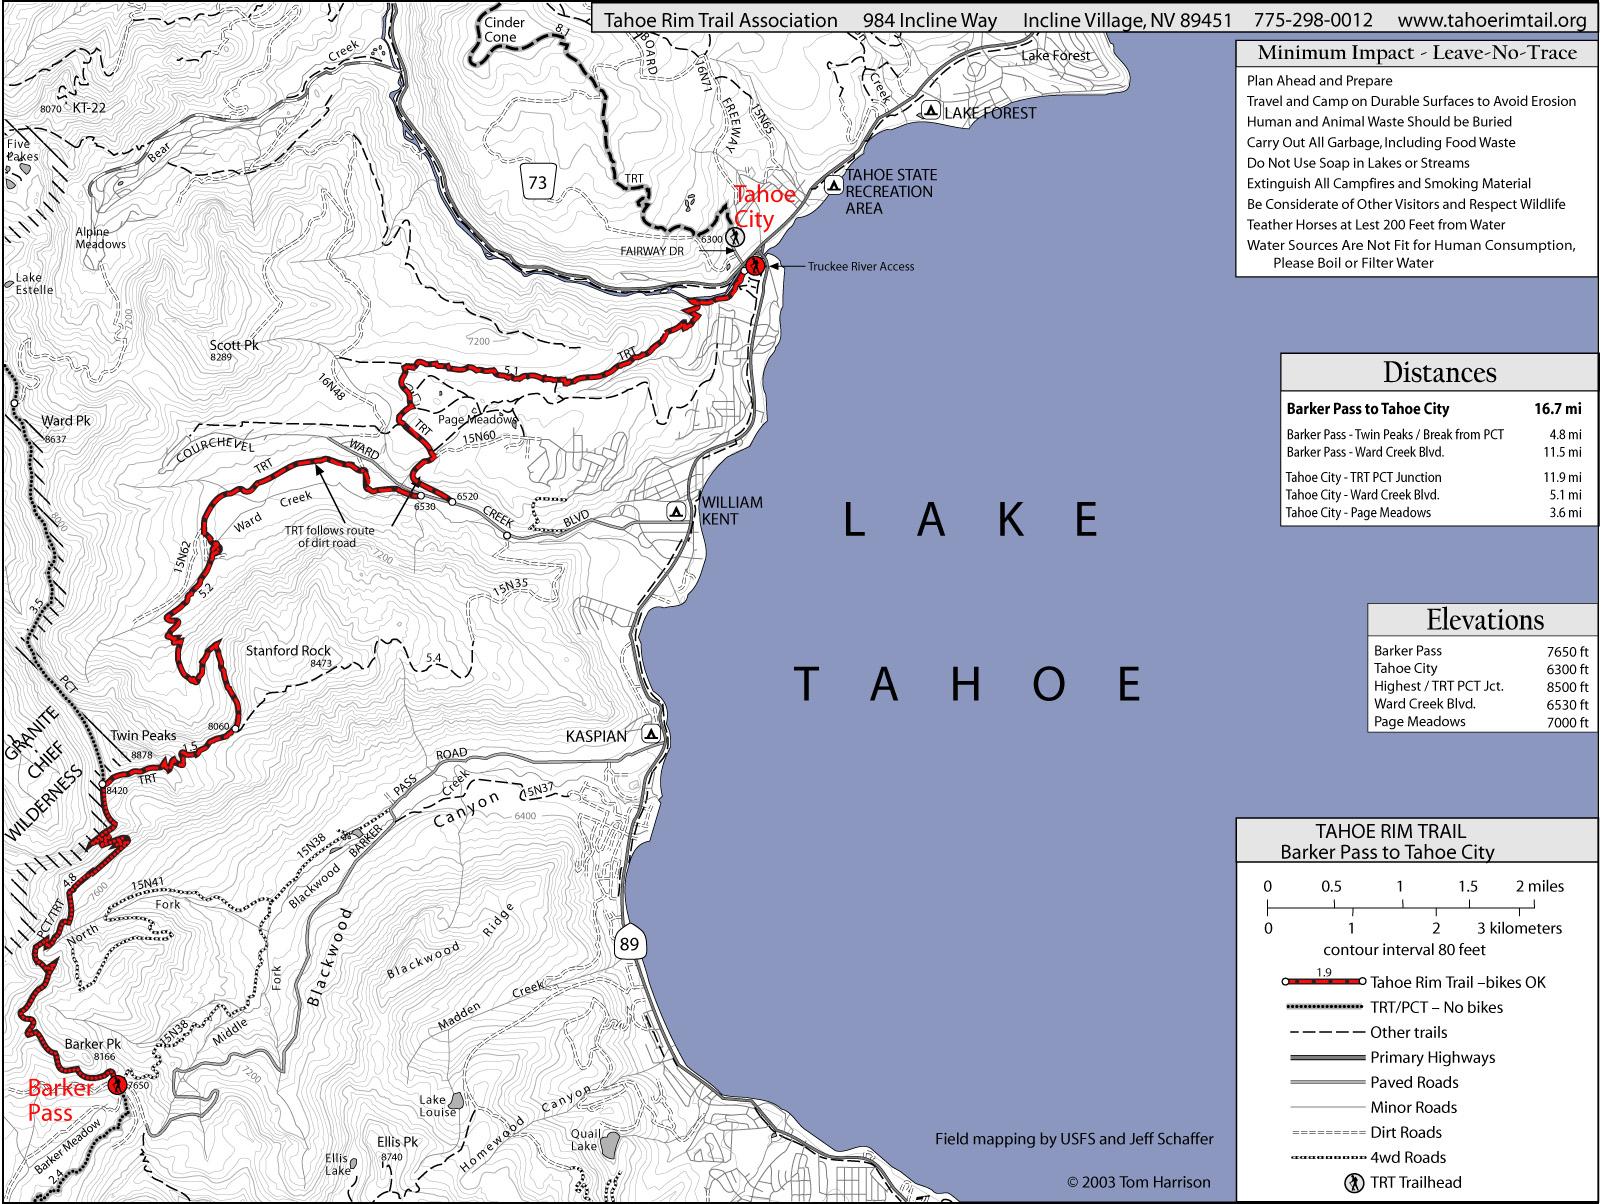 Tahoe Rim Trail Barker Pass To Tahoe City Map - Lake Tahoe Ca • Mappery - Tahoe City California Map